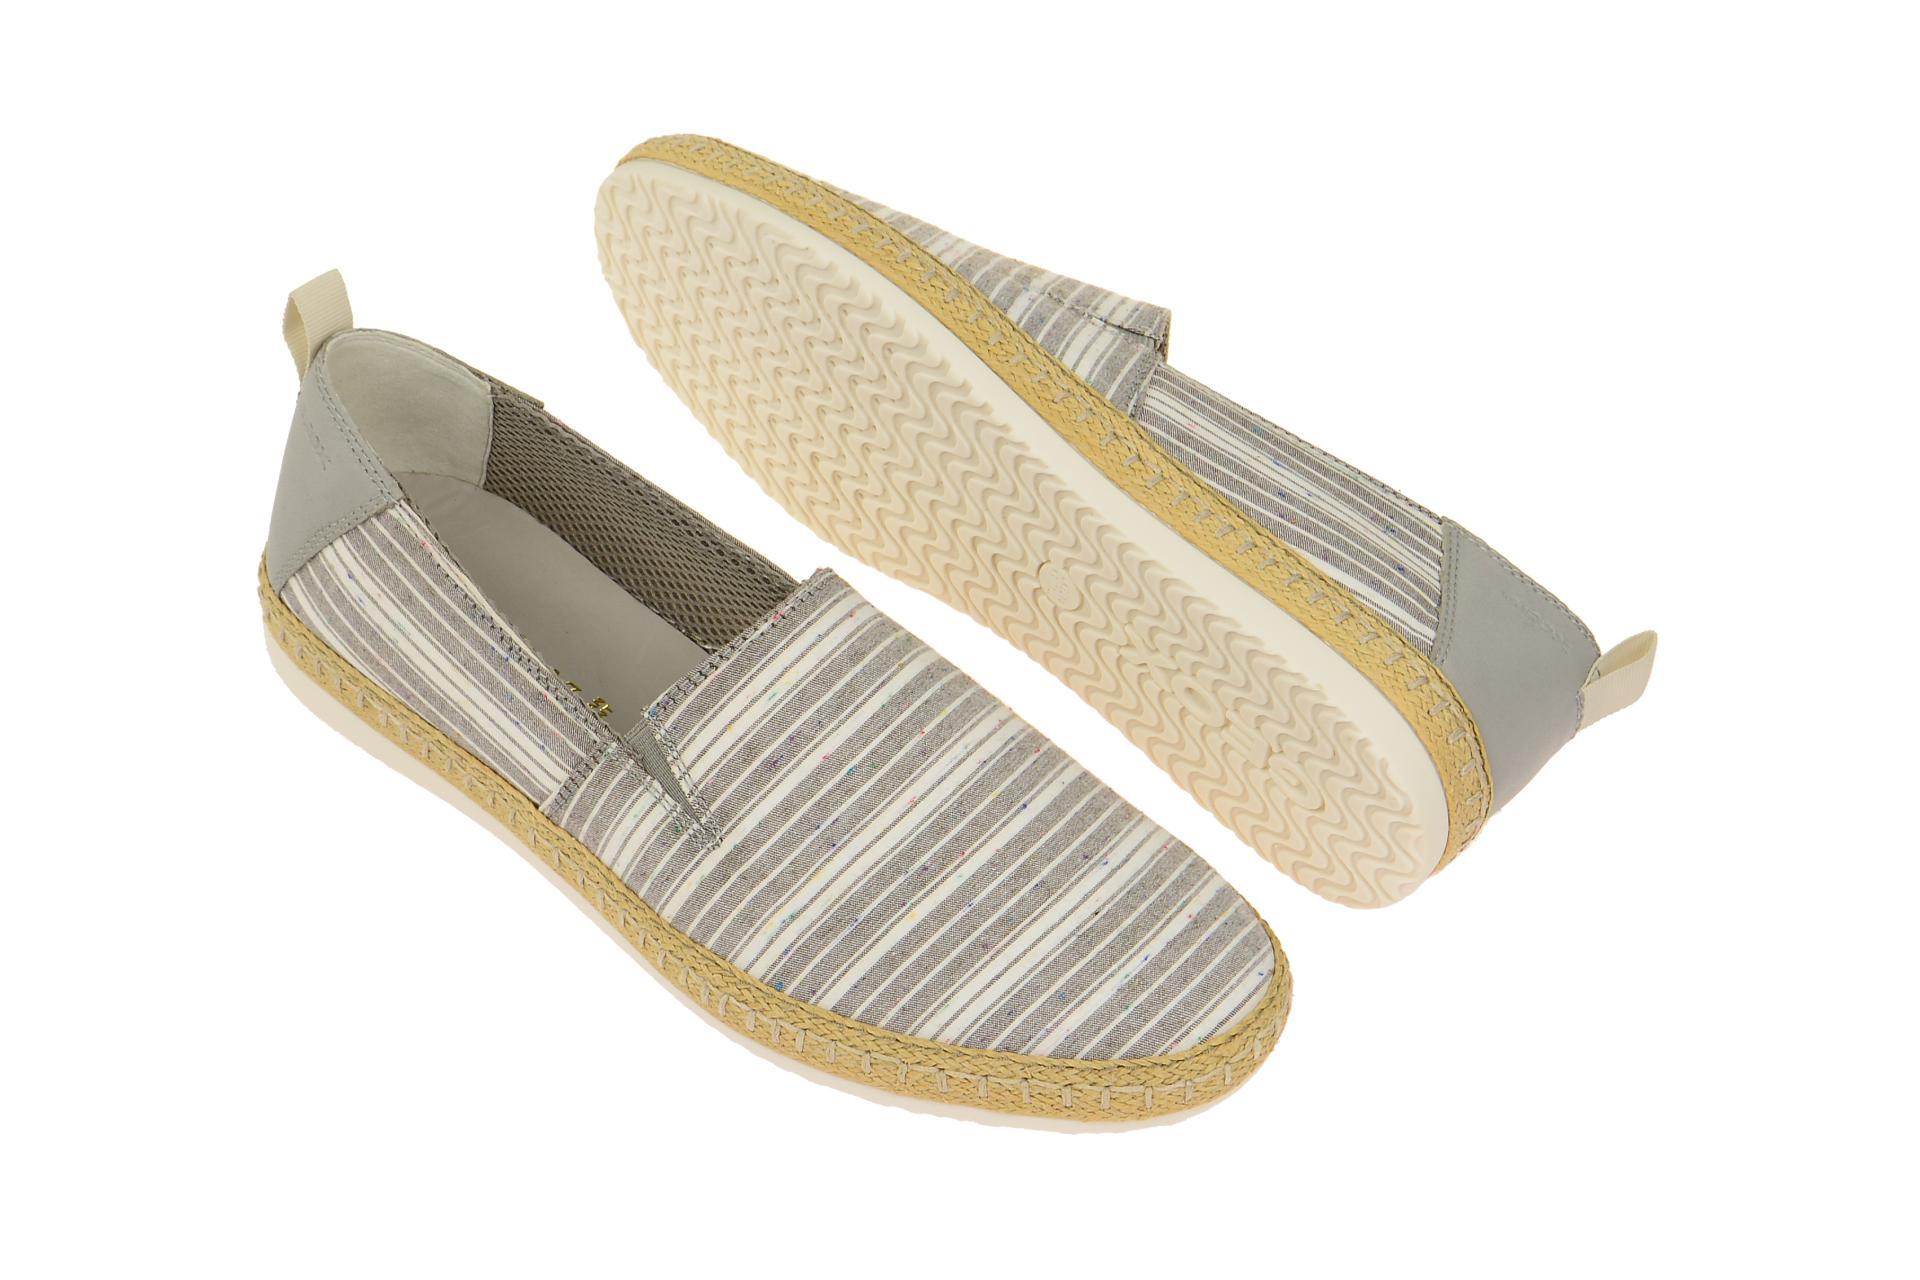 Geox Schuhe COPACABANA grau Herrenschuhe bequeme Slipper U72B7C 0ZB85 C0579